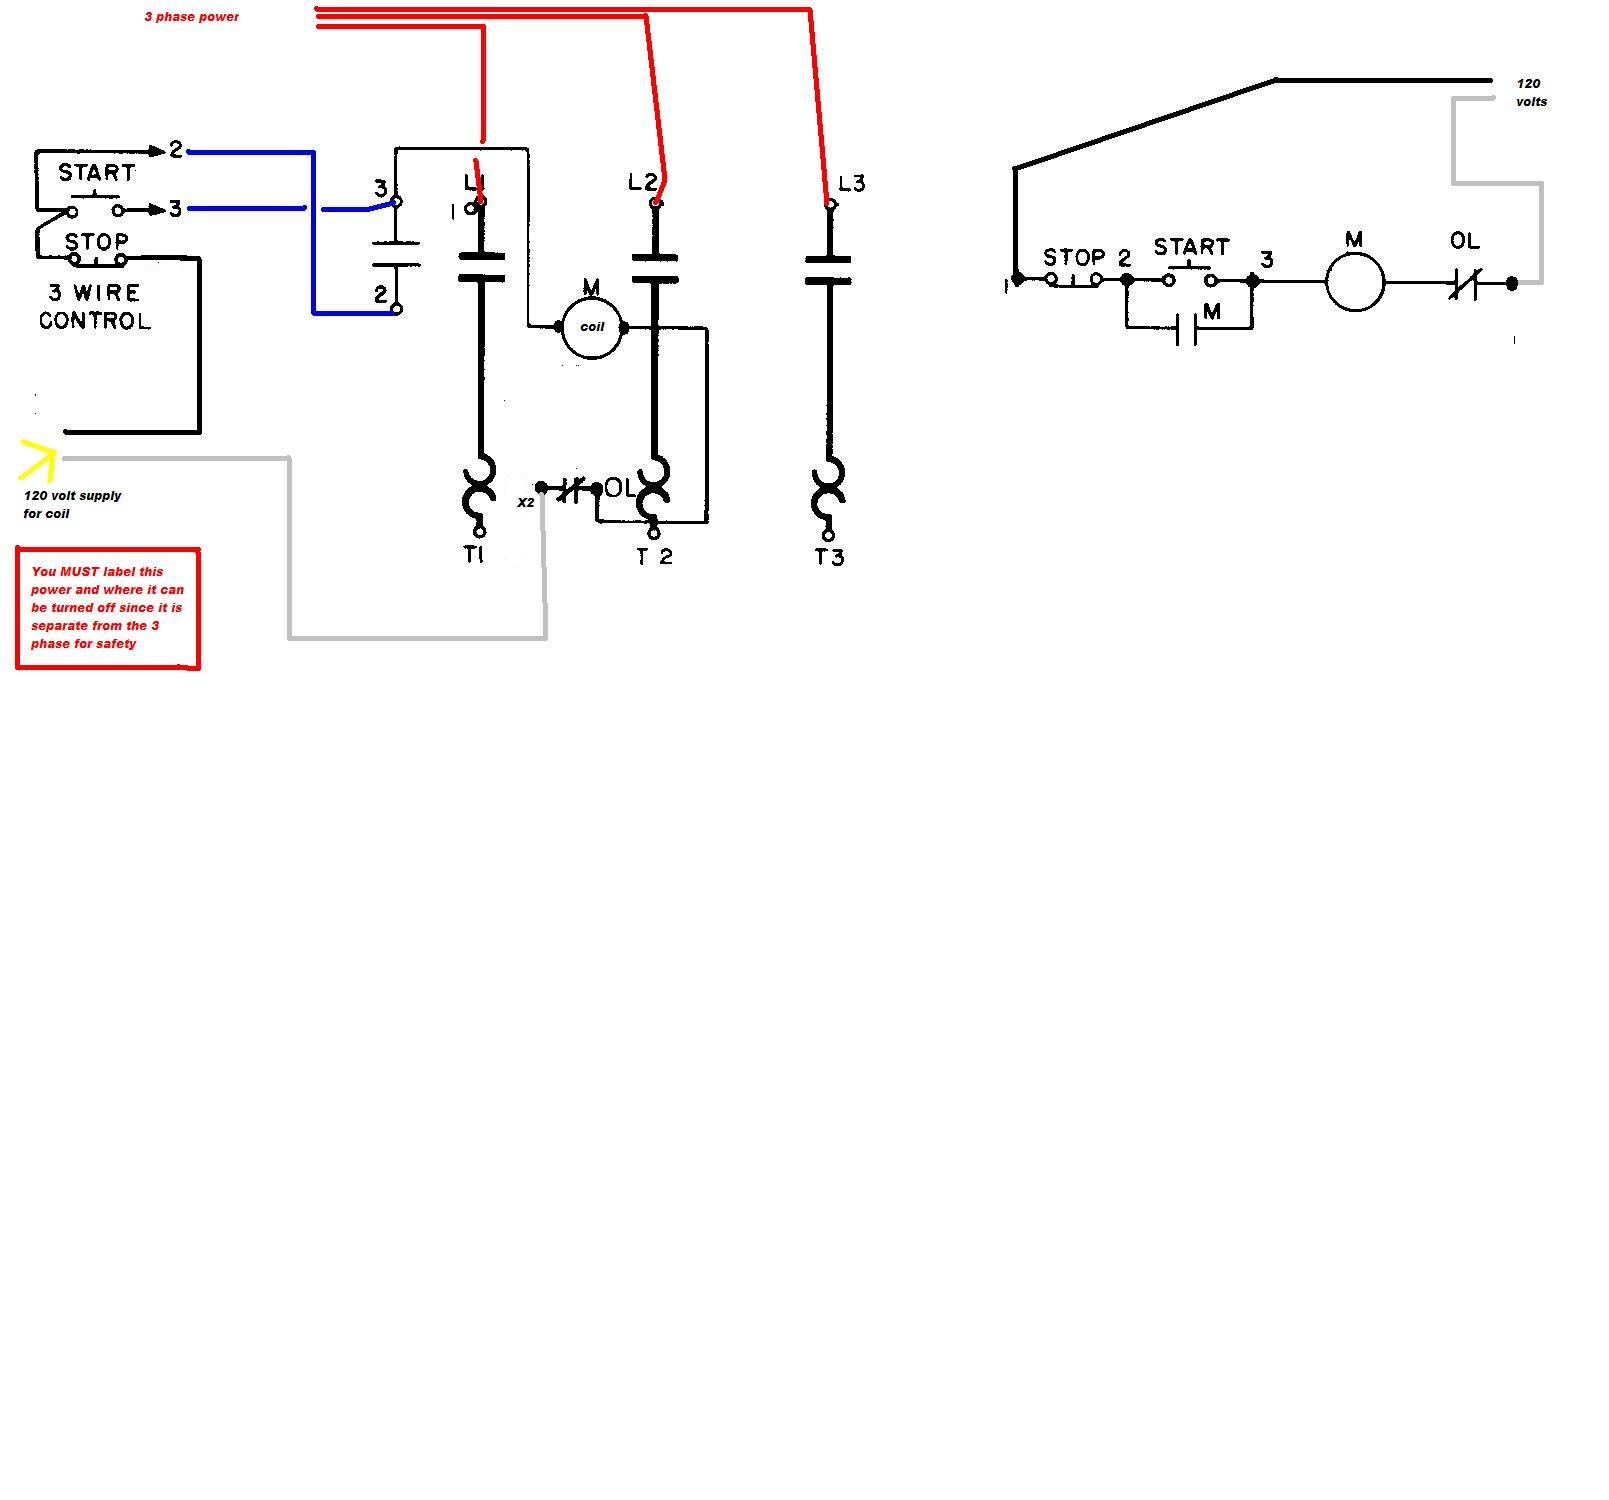 Combination Starter Wiring Diagram With Hoa House Wiring Diagram In Sri Lanka For Wiring Diagram Schematics